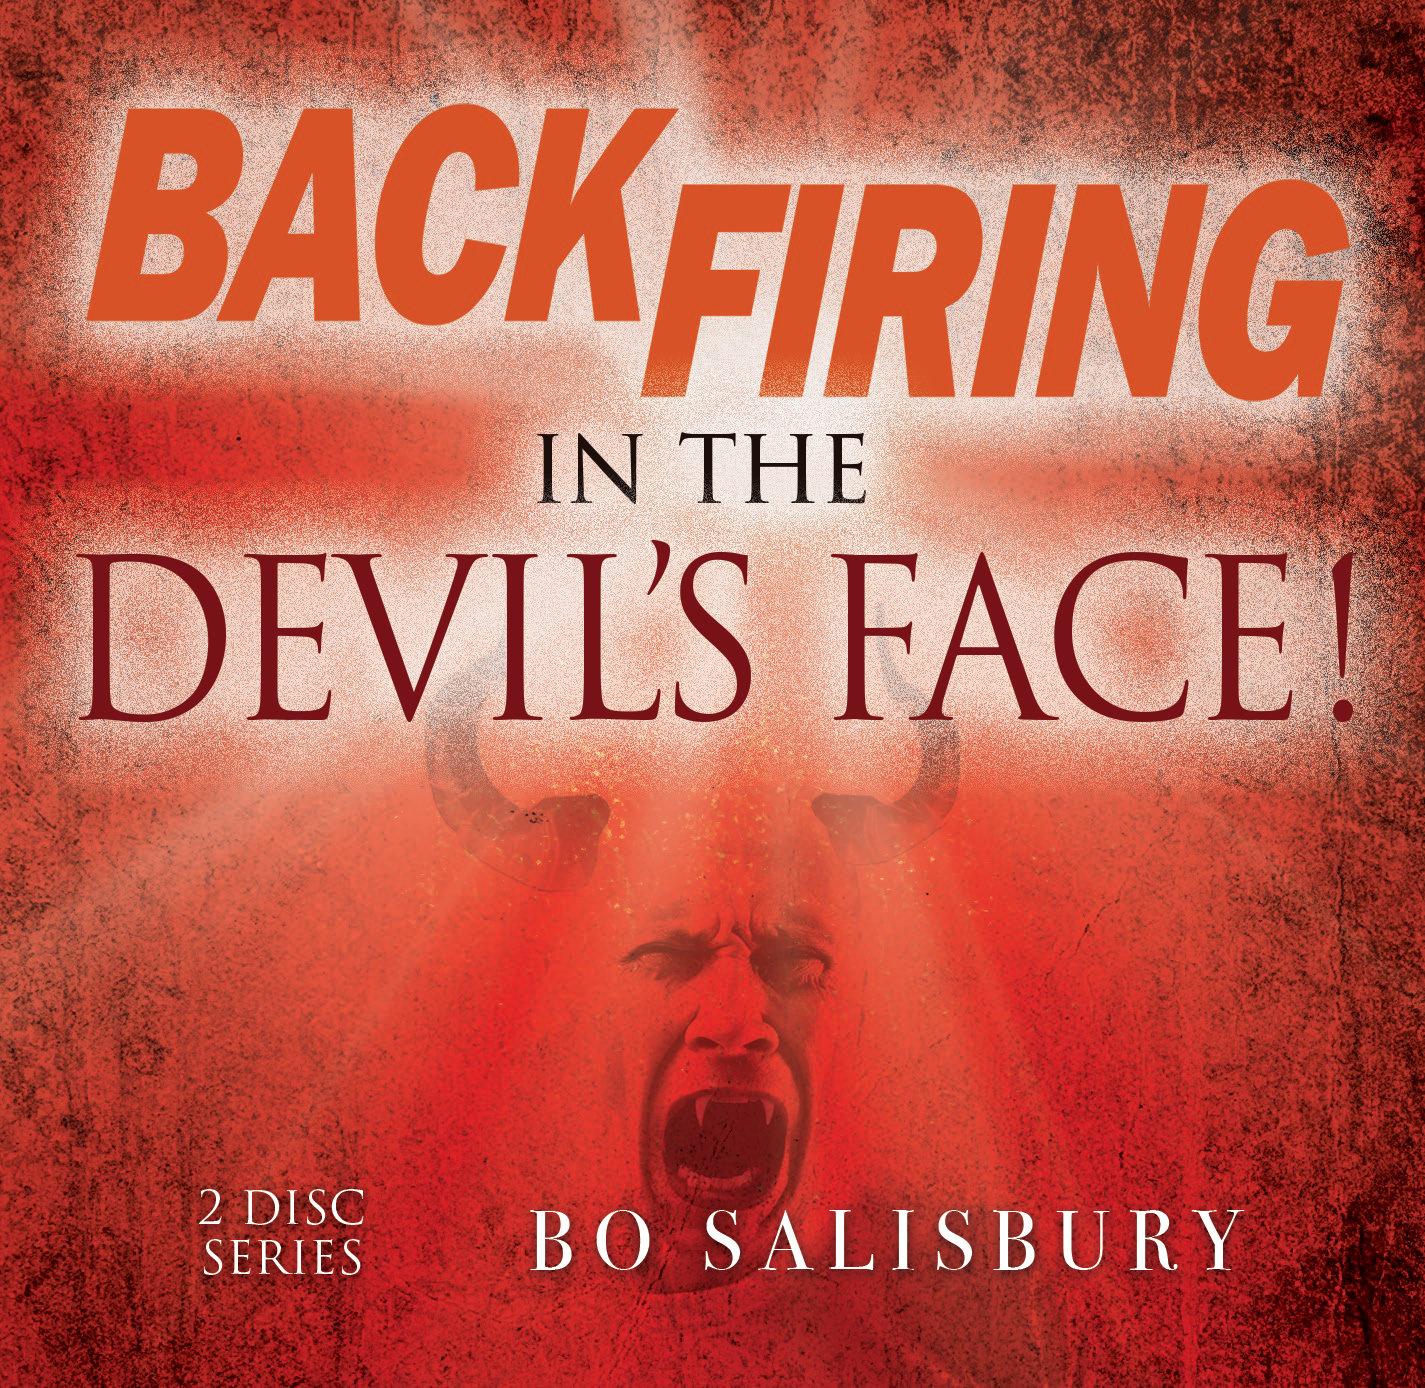 Backfiring in the Devil's Face!